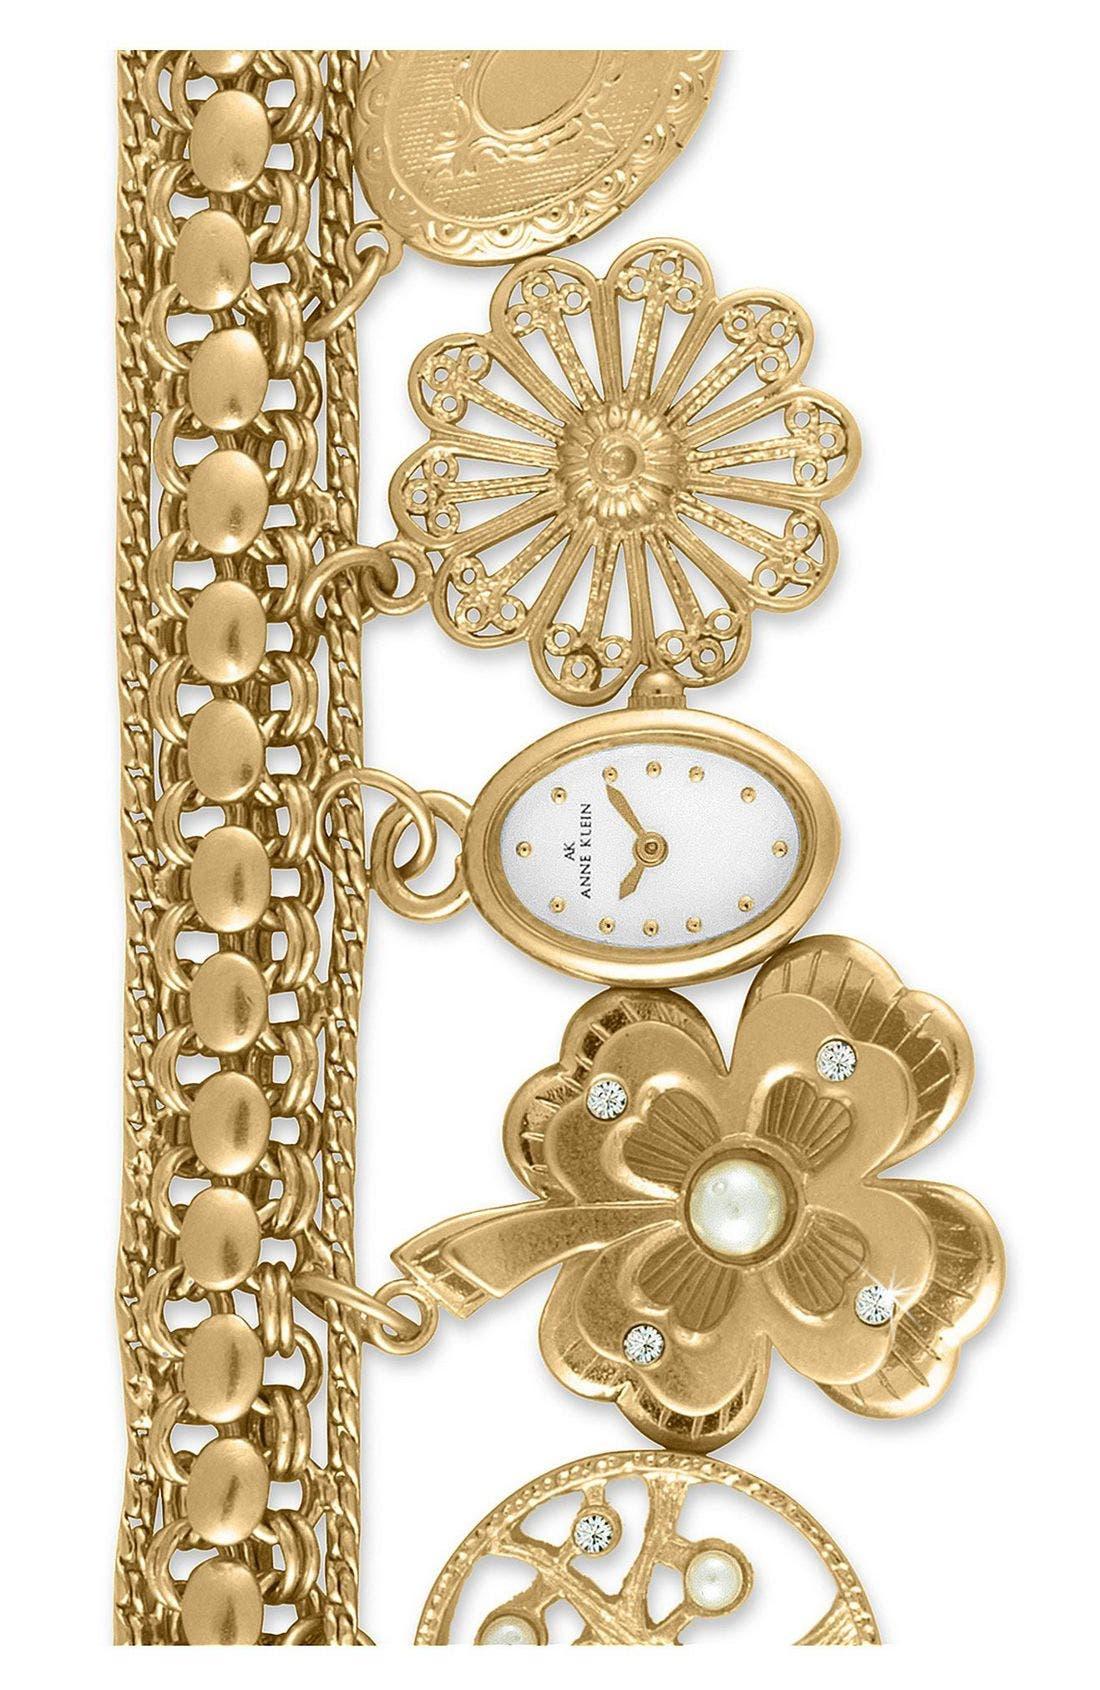 Anne Klein Oval Case Charm Bracelet Watch